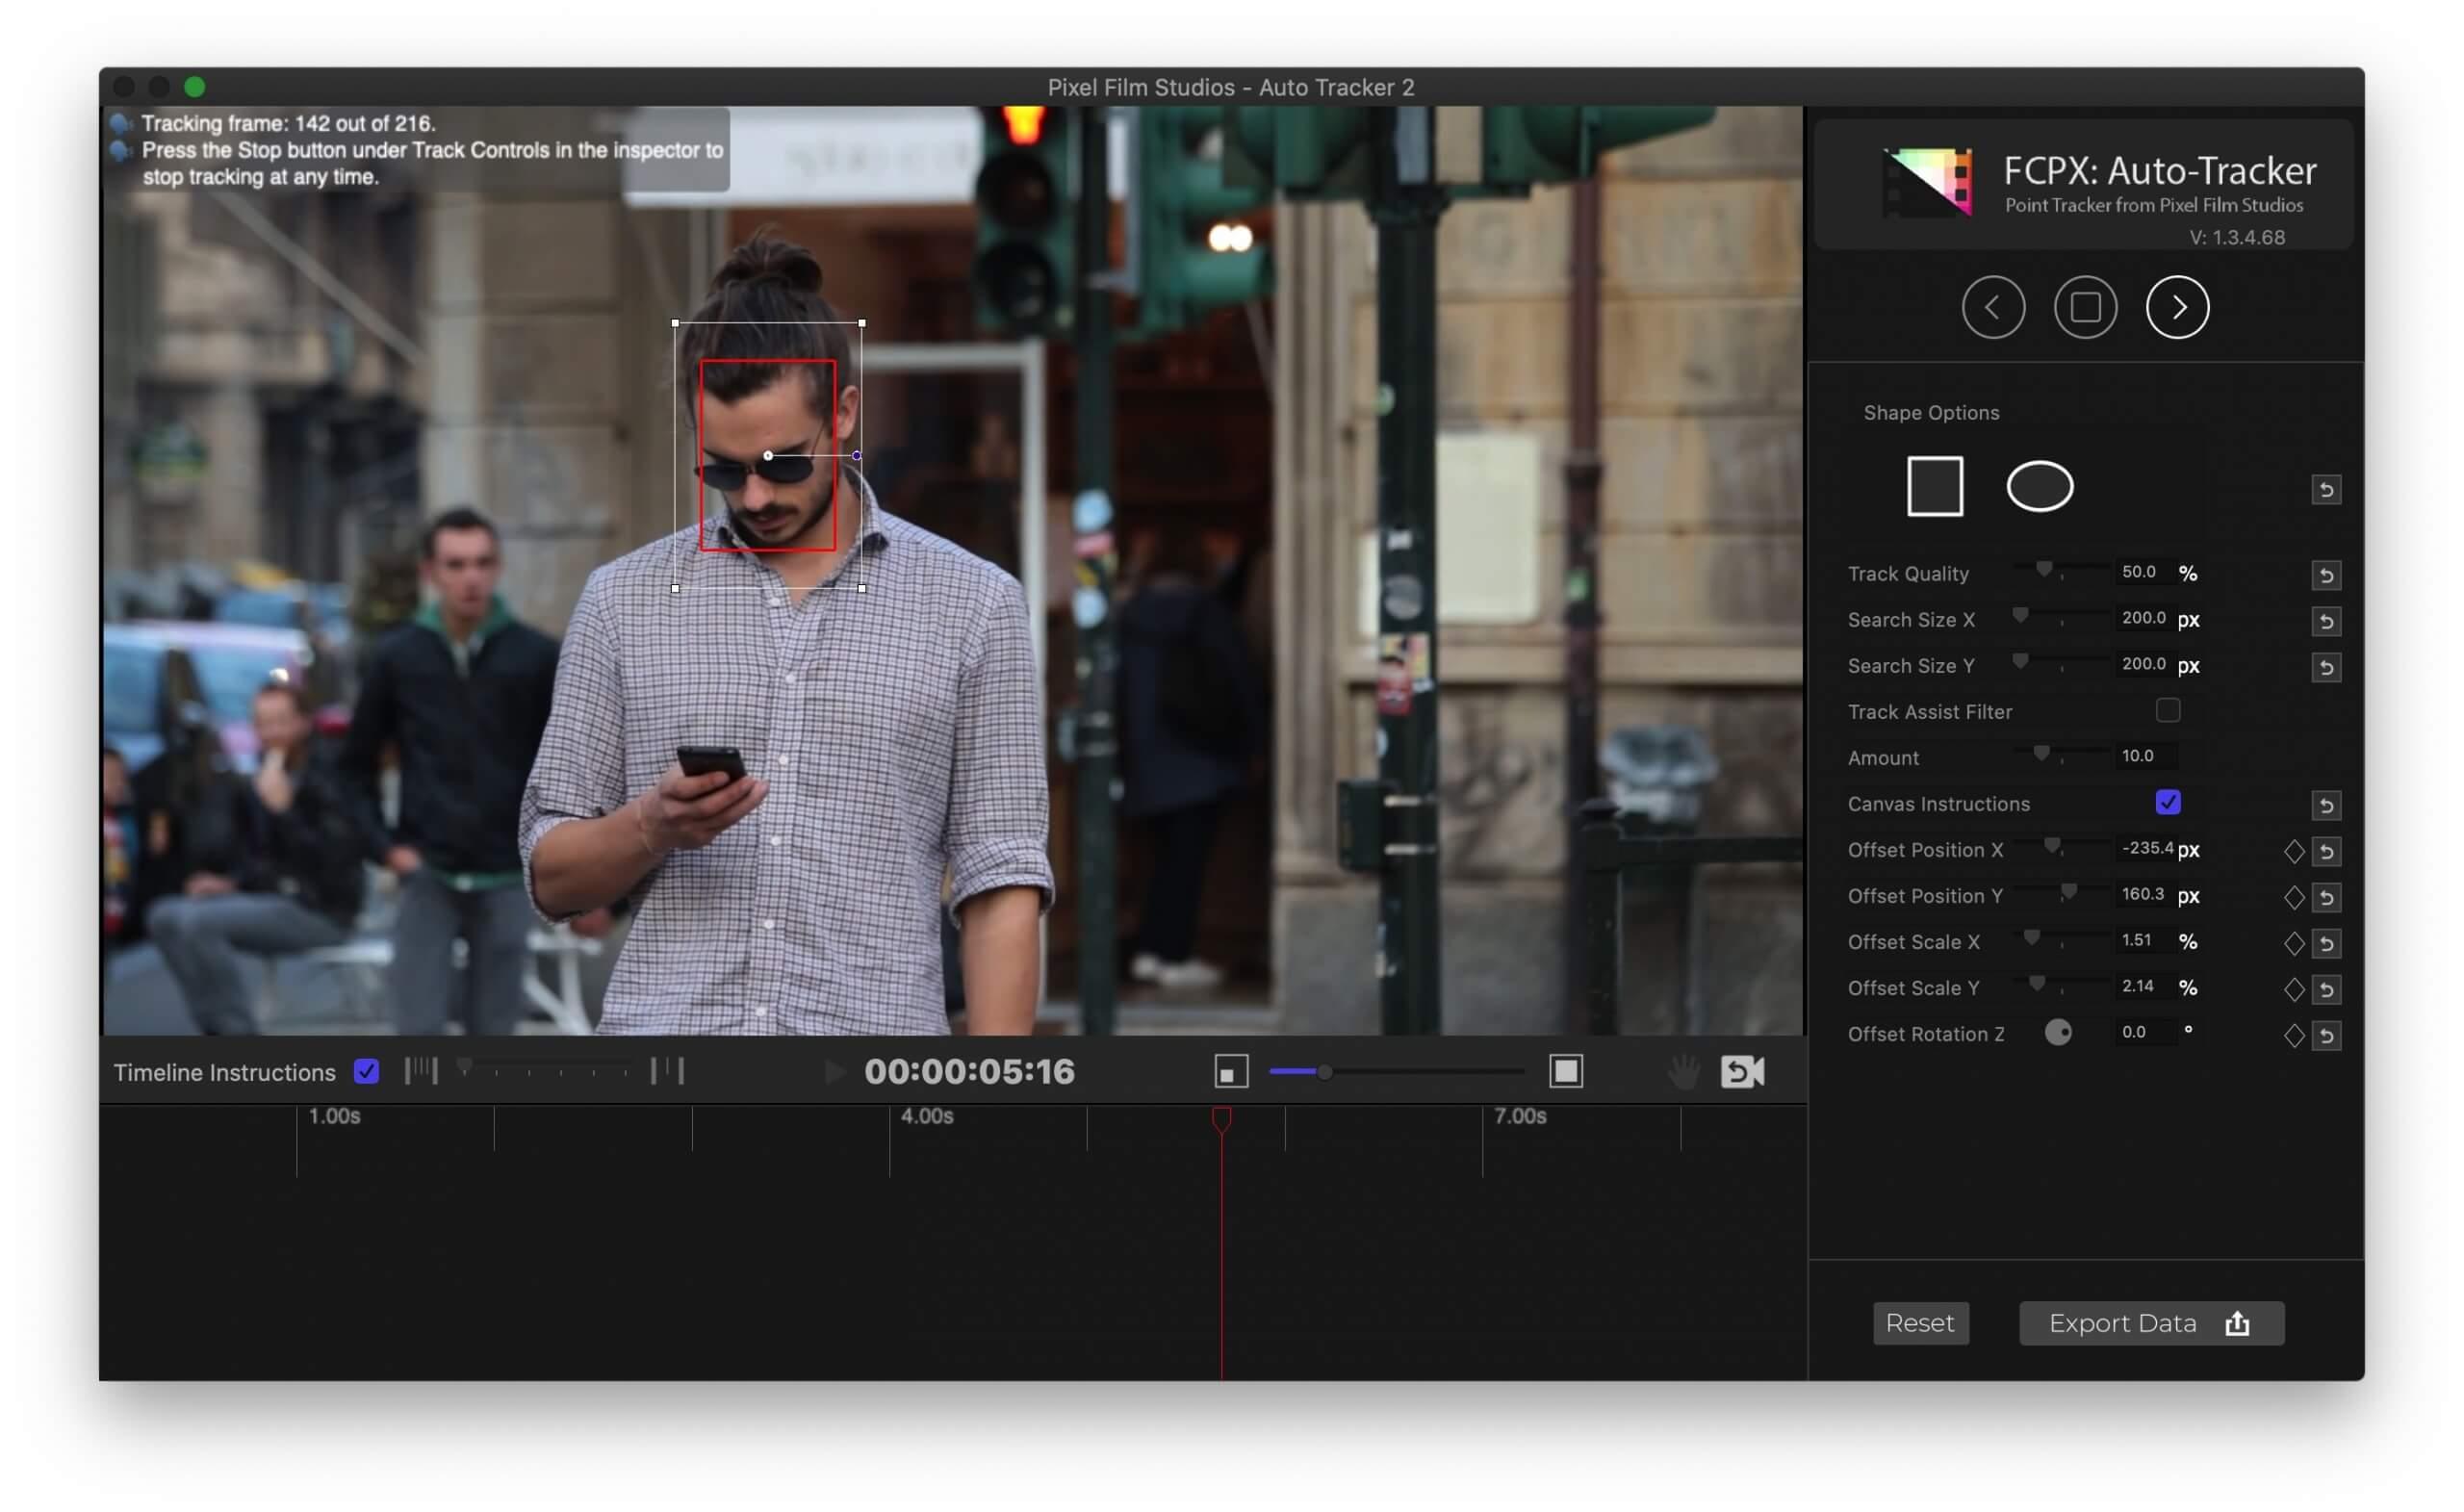 fcpx插件 脸部局部扭曲液化变形自动跟踪工具 支持 fcpx 10.5.1 Distortion Tracker 2